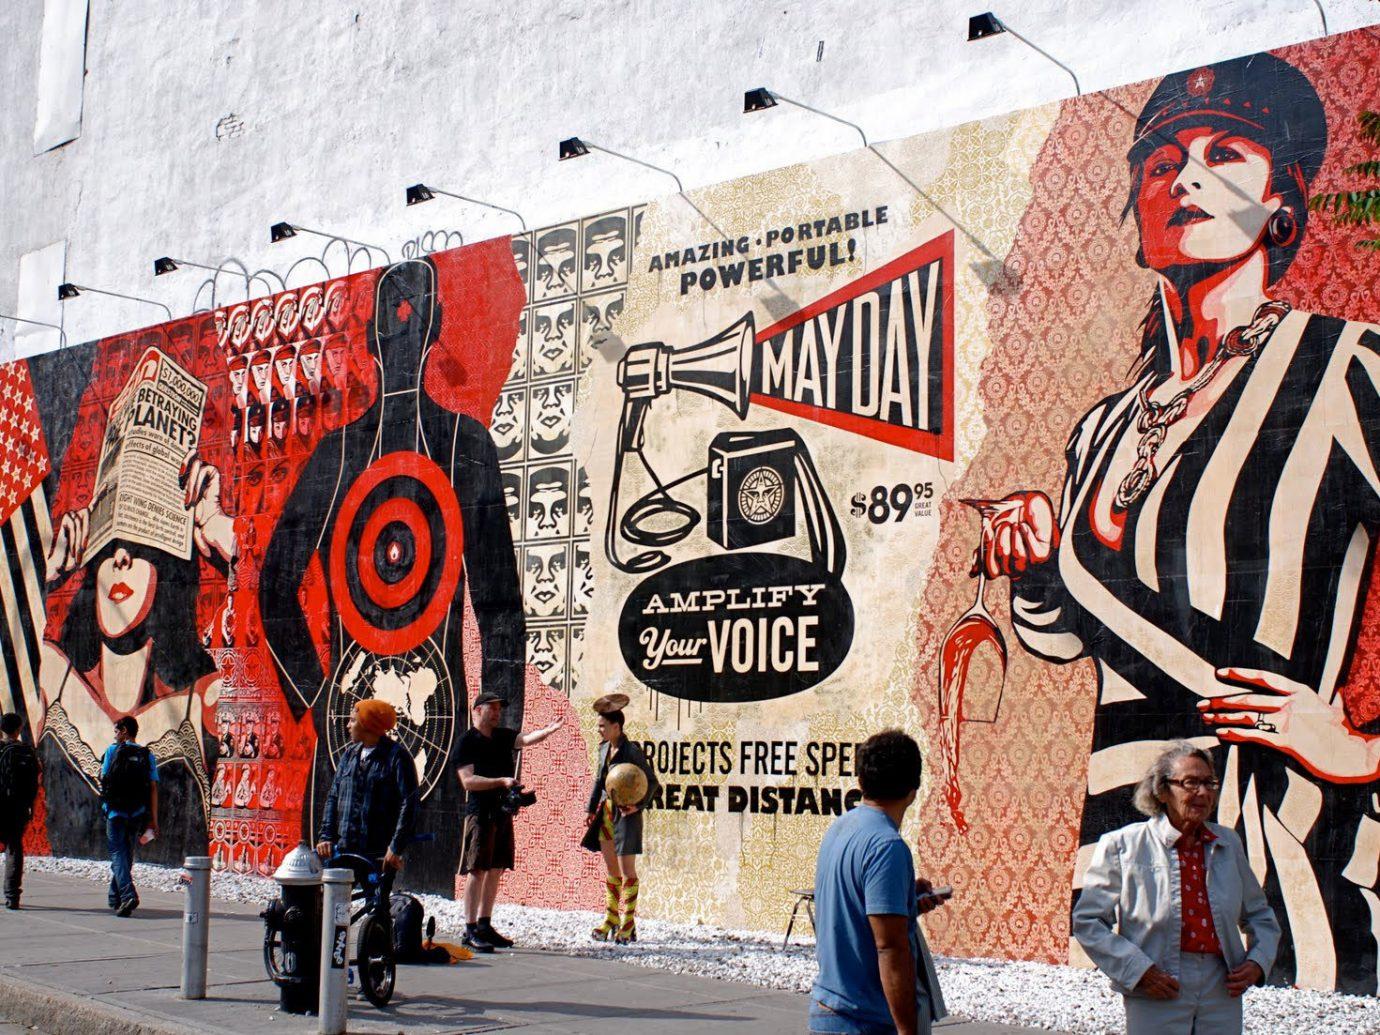 art Arts + Culture City city streets colorful graffiti Hotels street art streets urban walking road street mural infrastructure